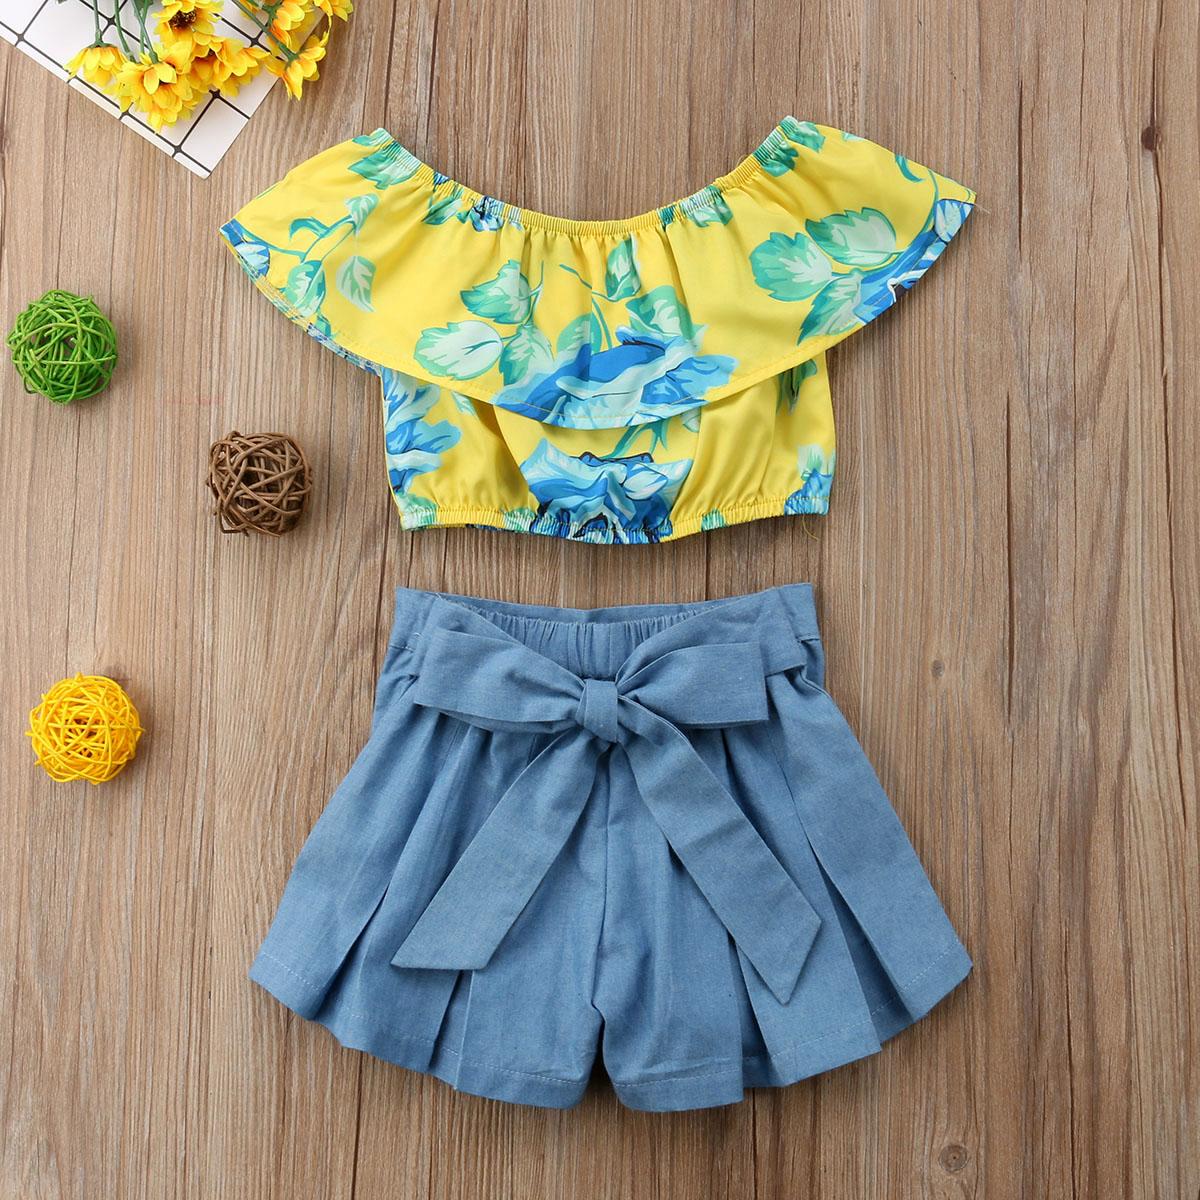 Summer Flower Baby Girl Kids Clothing Set Off Shoulder Tops+ Bow Denim Shorts Pants Outfits Child Clothes Set